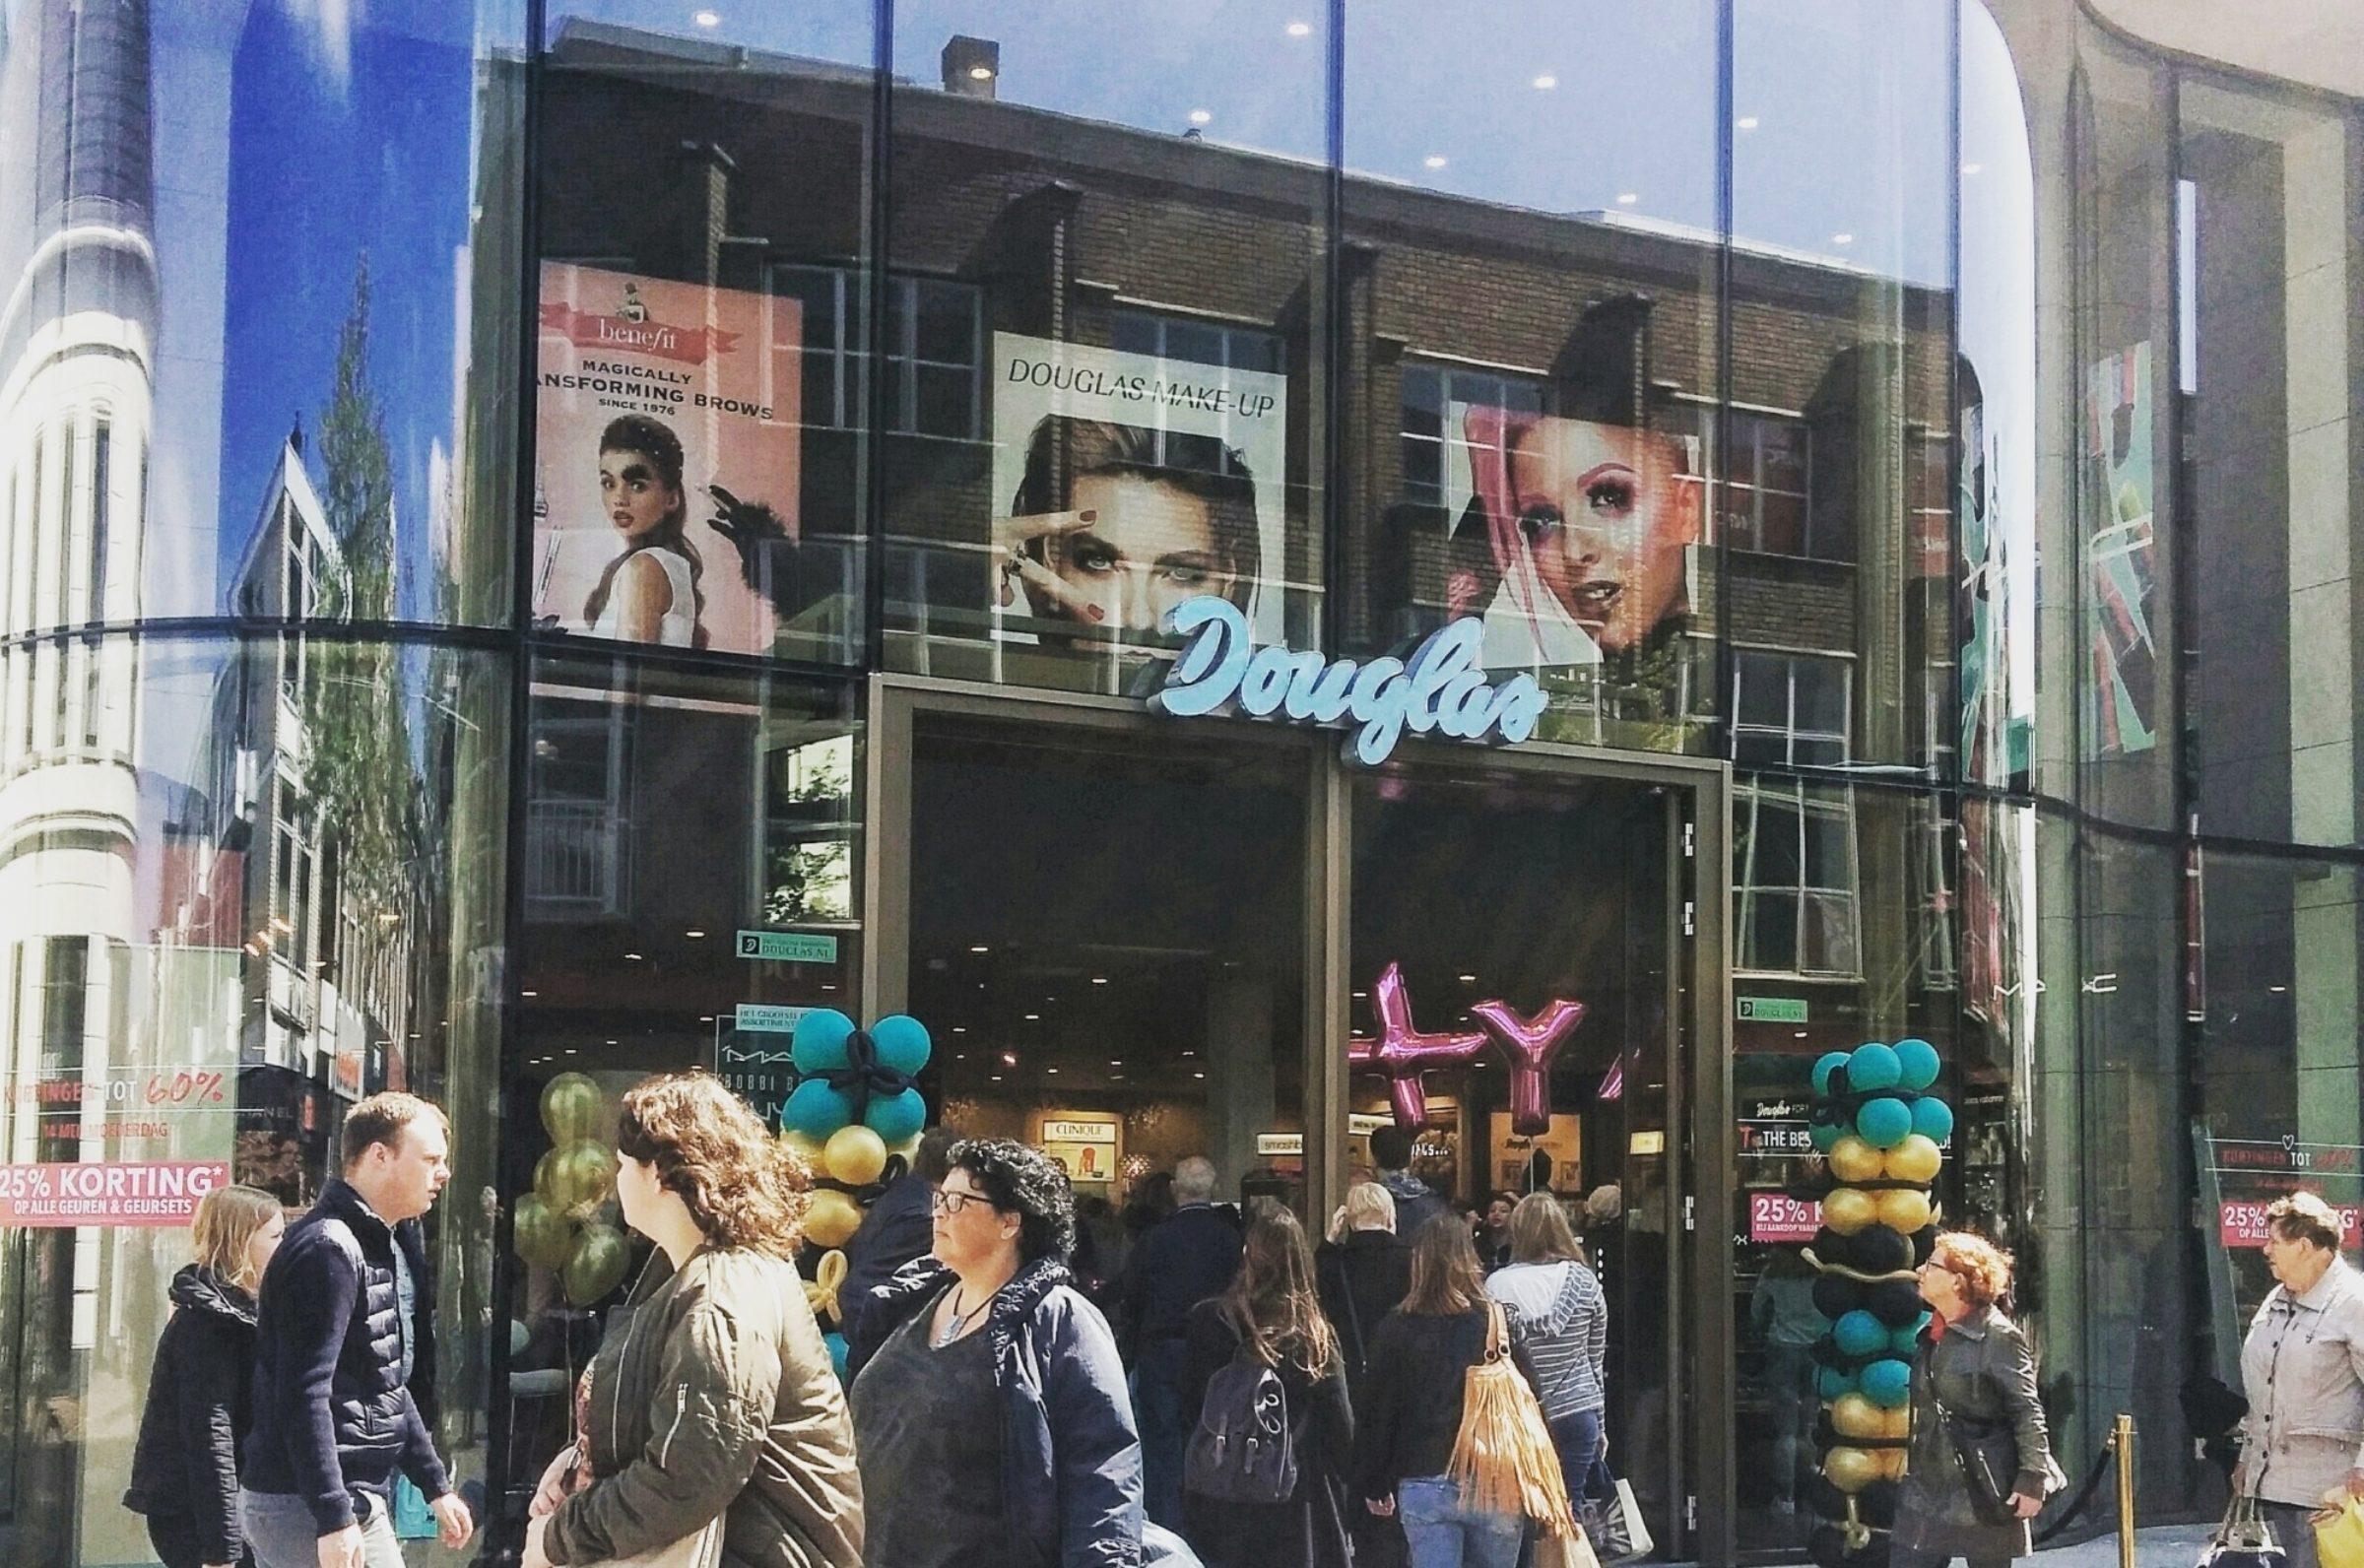 2017 Douglas Kalanderstraat winkelen 3266 1561470065 35hxjj516n